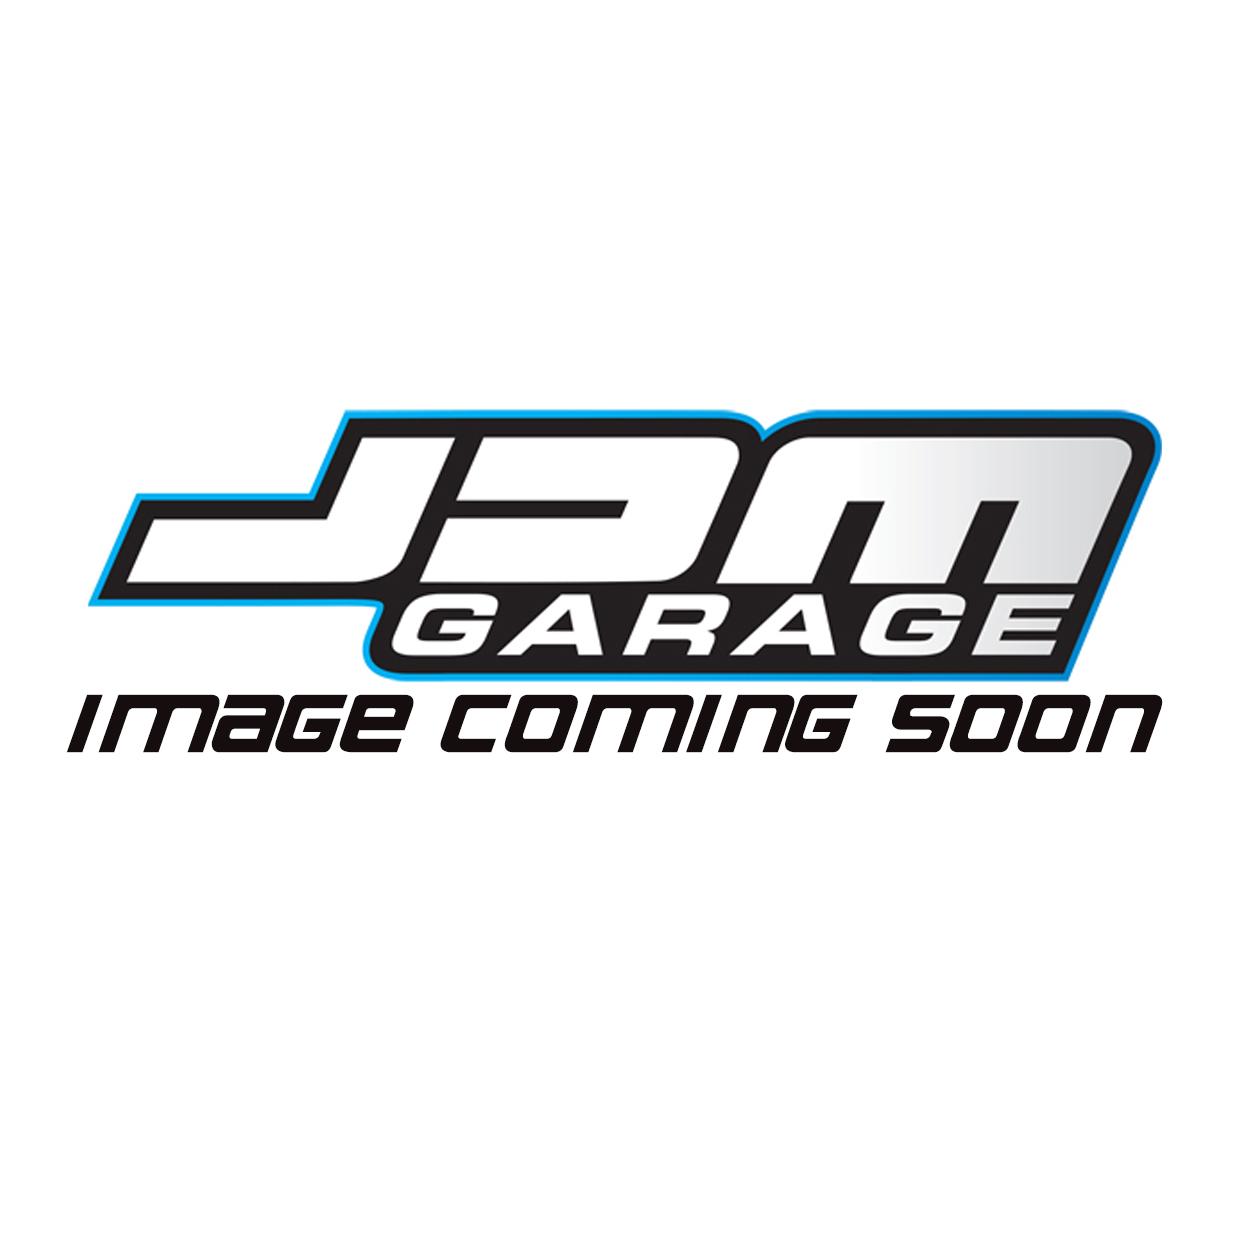 Genuine Nissan Engine Gasket Set - R35 GTR VR38DETT - A0101-JF00A